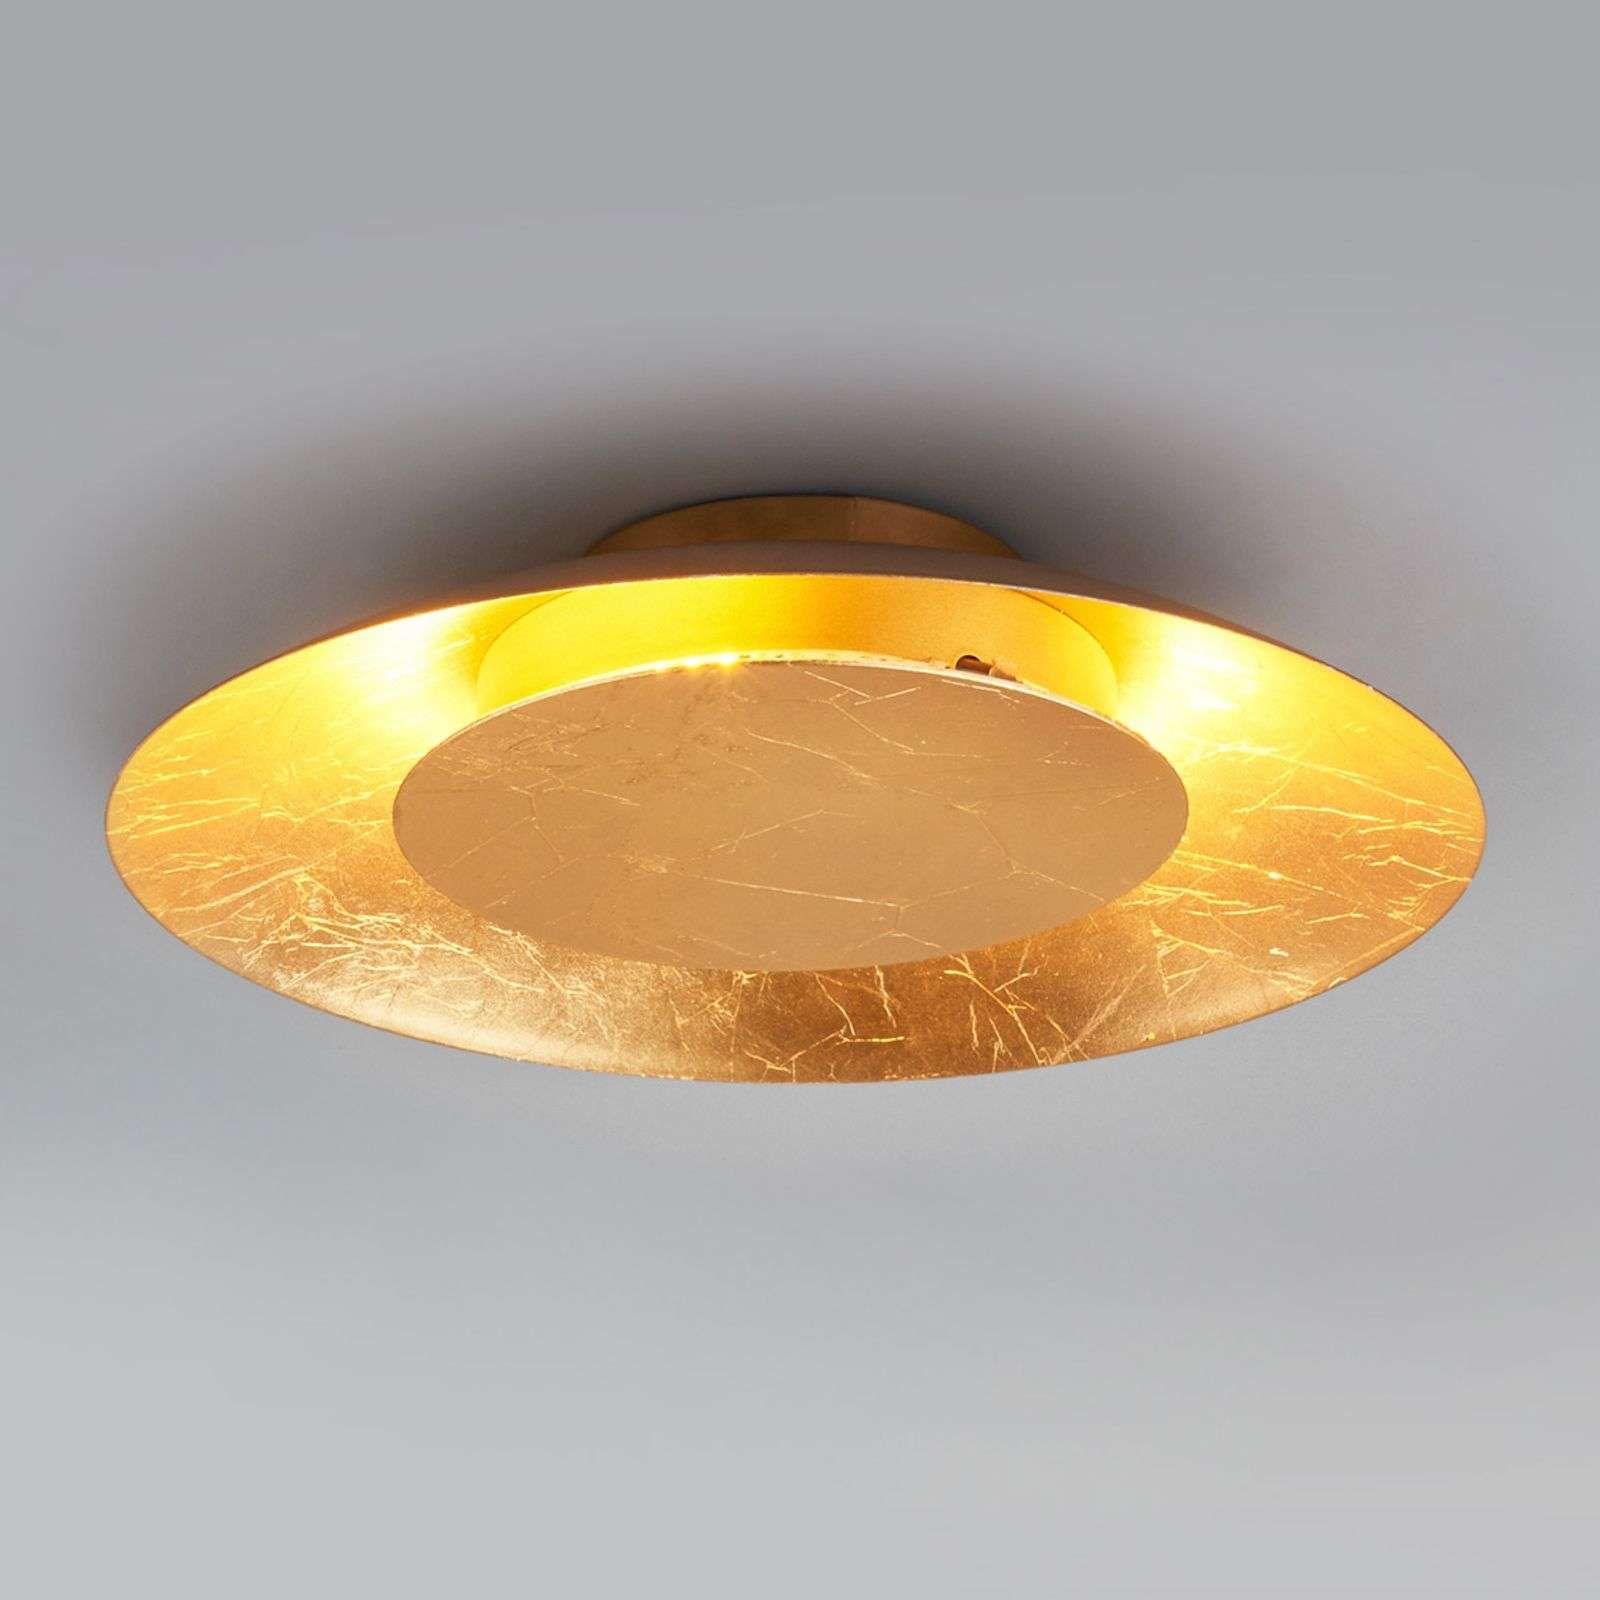 Plafondlamp Zwart Plafond Lampa Plafondlamp Led Met Bewegingssensor Led Verlichting Plafonniere Plafondlamp 3 Spots Plafondlamp Plafondverlichting Led